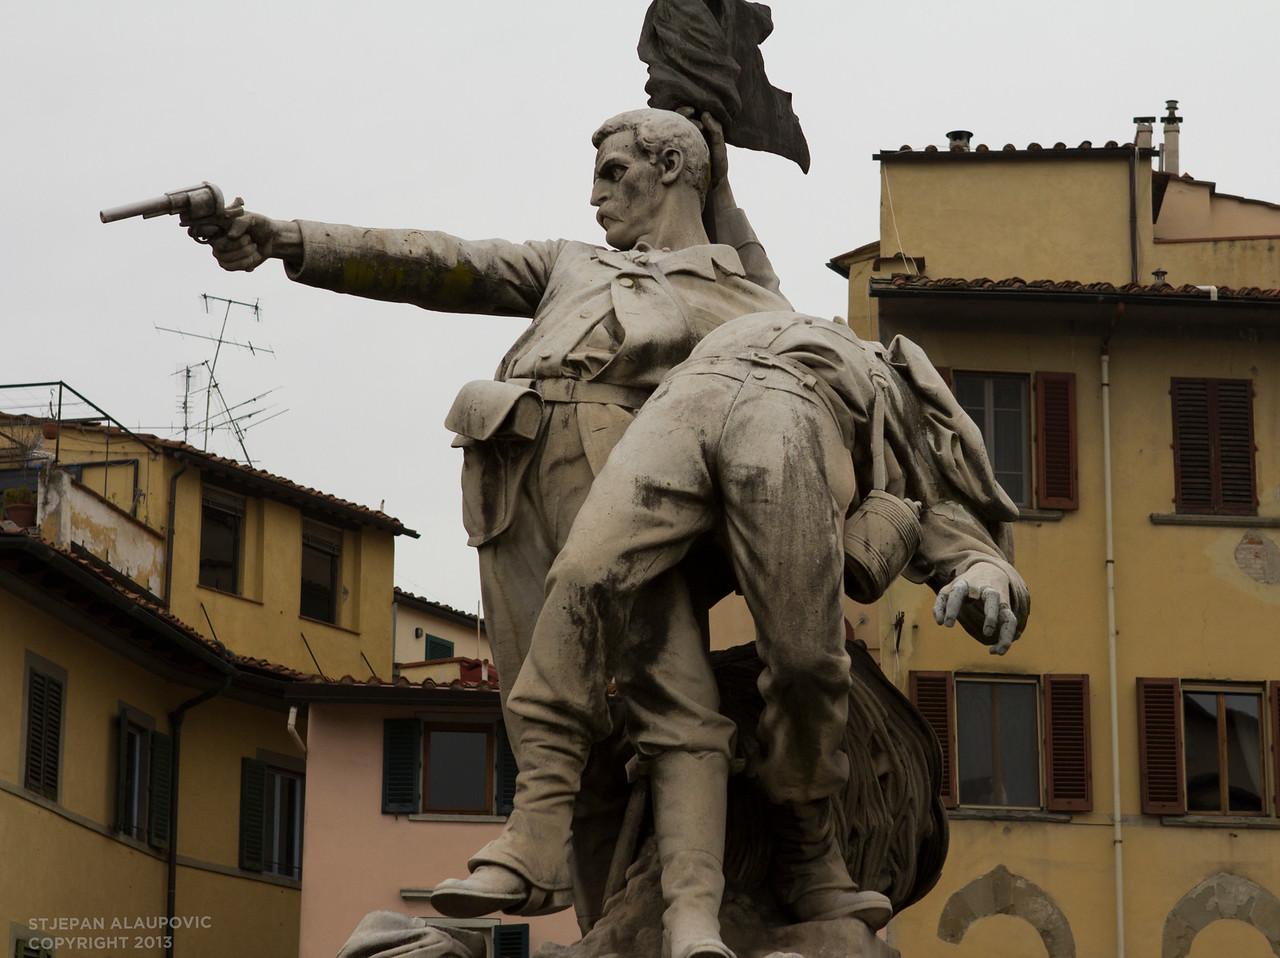 Gunman Statue